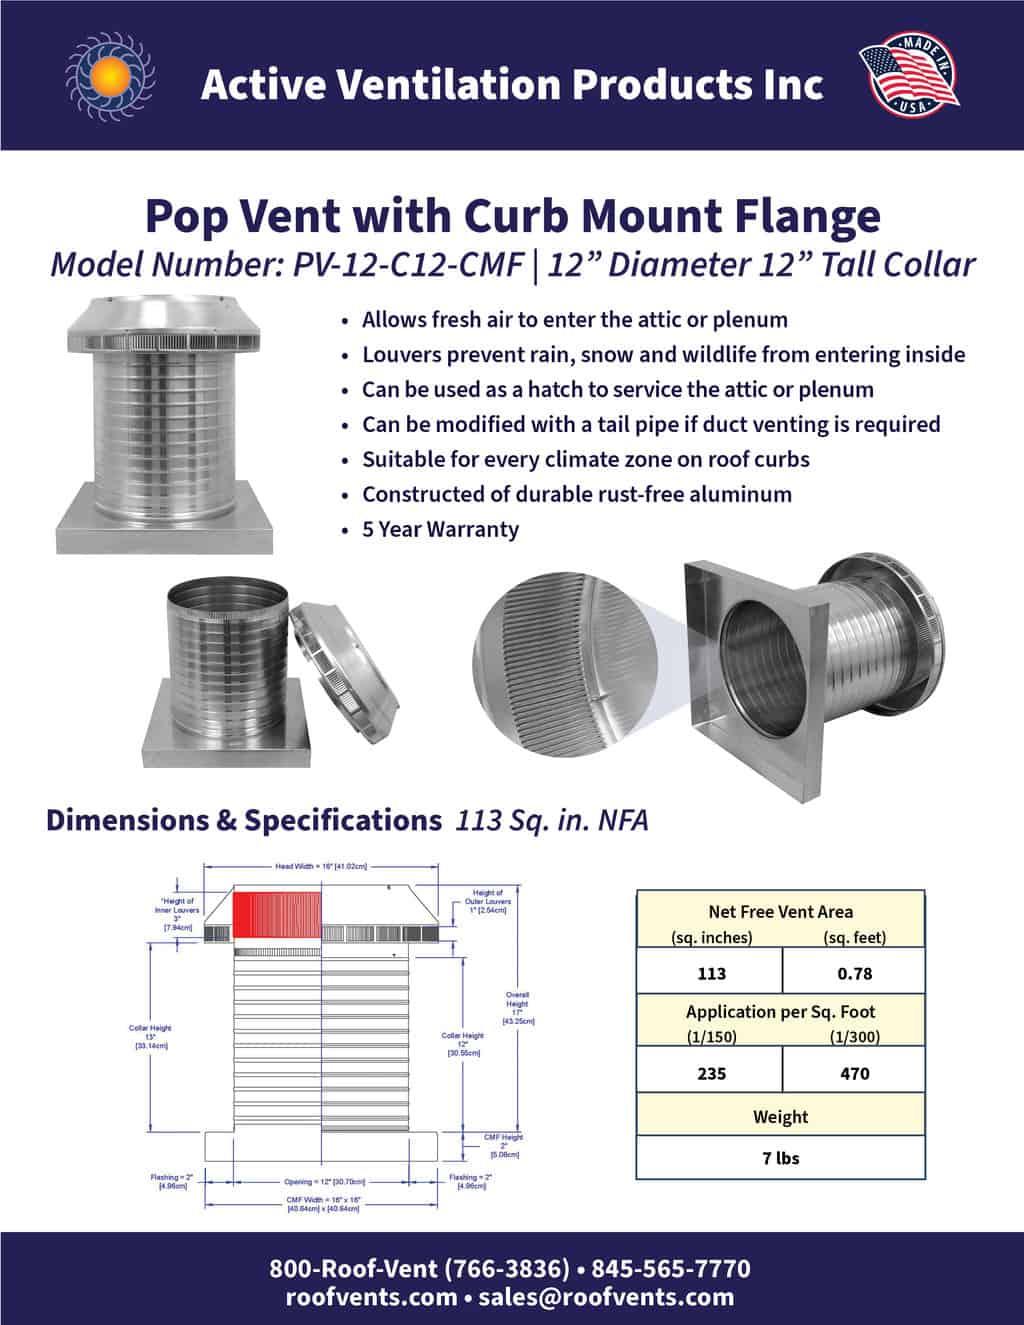 PV-12-C12-CMF-brochure